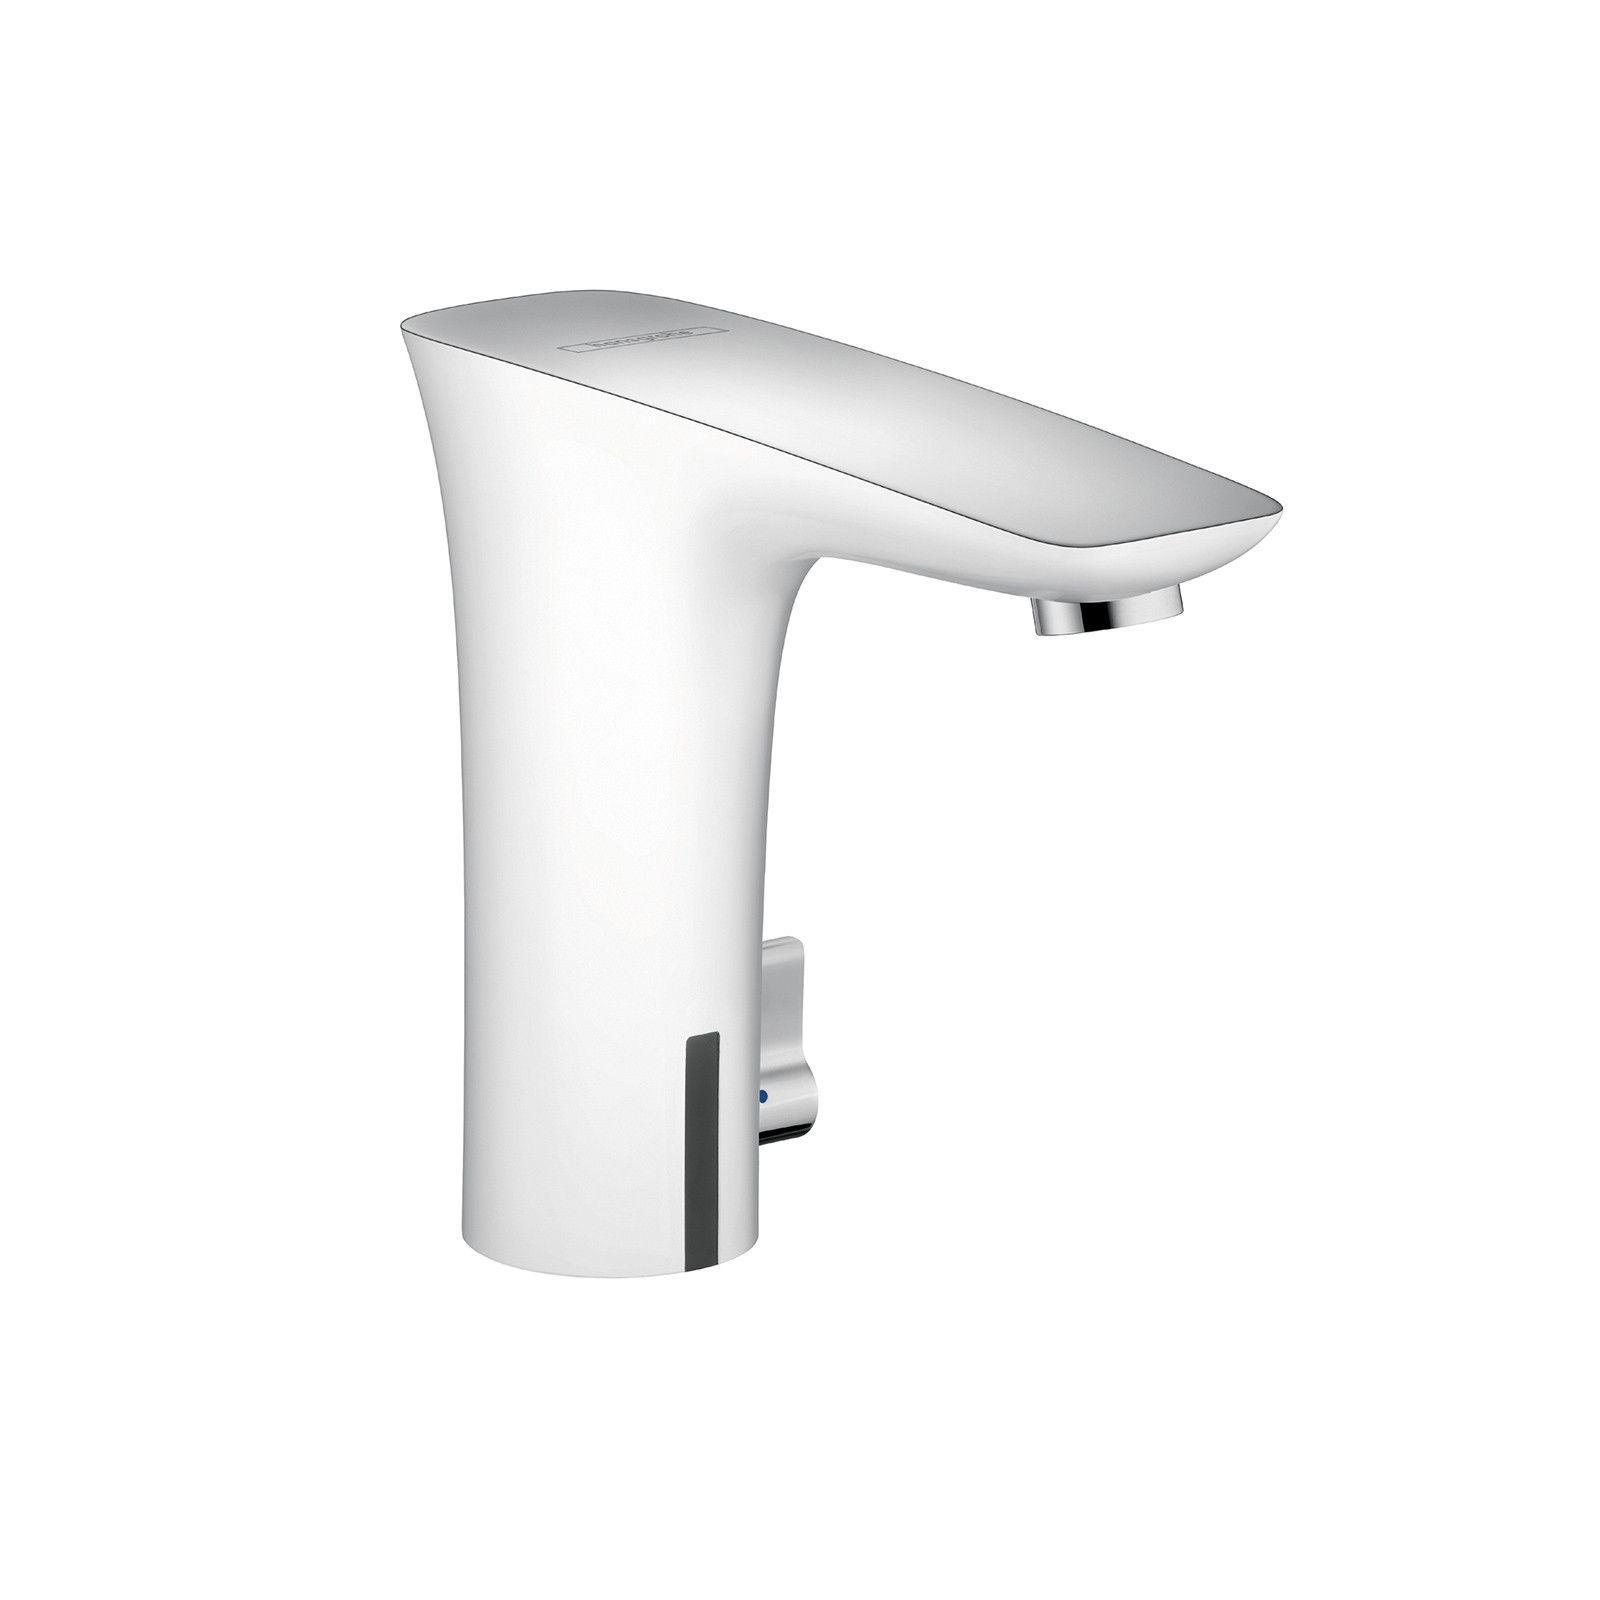 Hansgrohe 15170401 Chrome / White PuraVida Bathroom Faucet Single ...